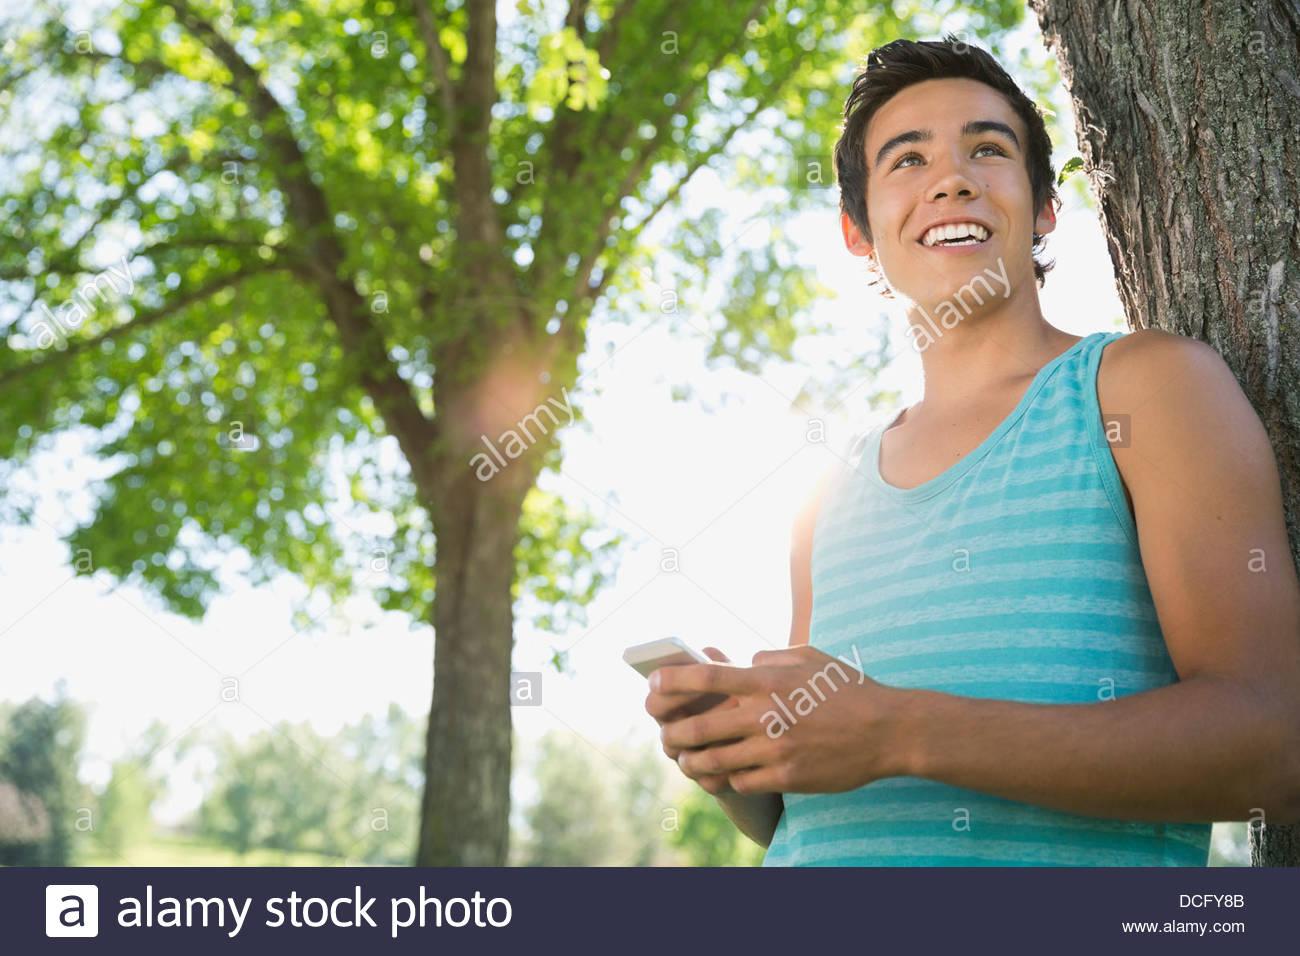 Adolescente con teléfonos inteligentes. Imagen De Stock